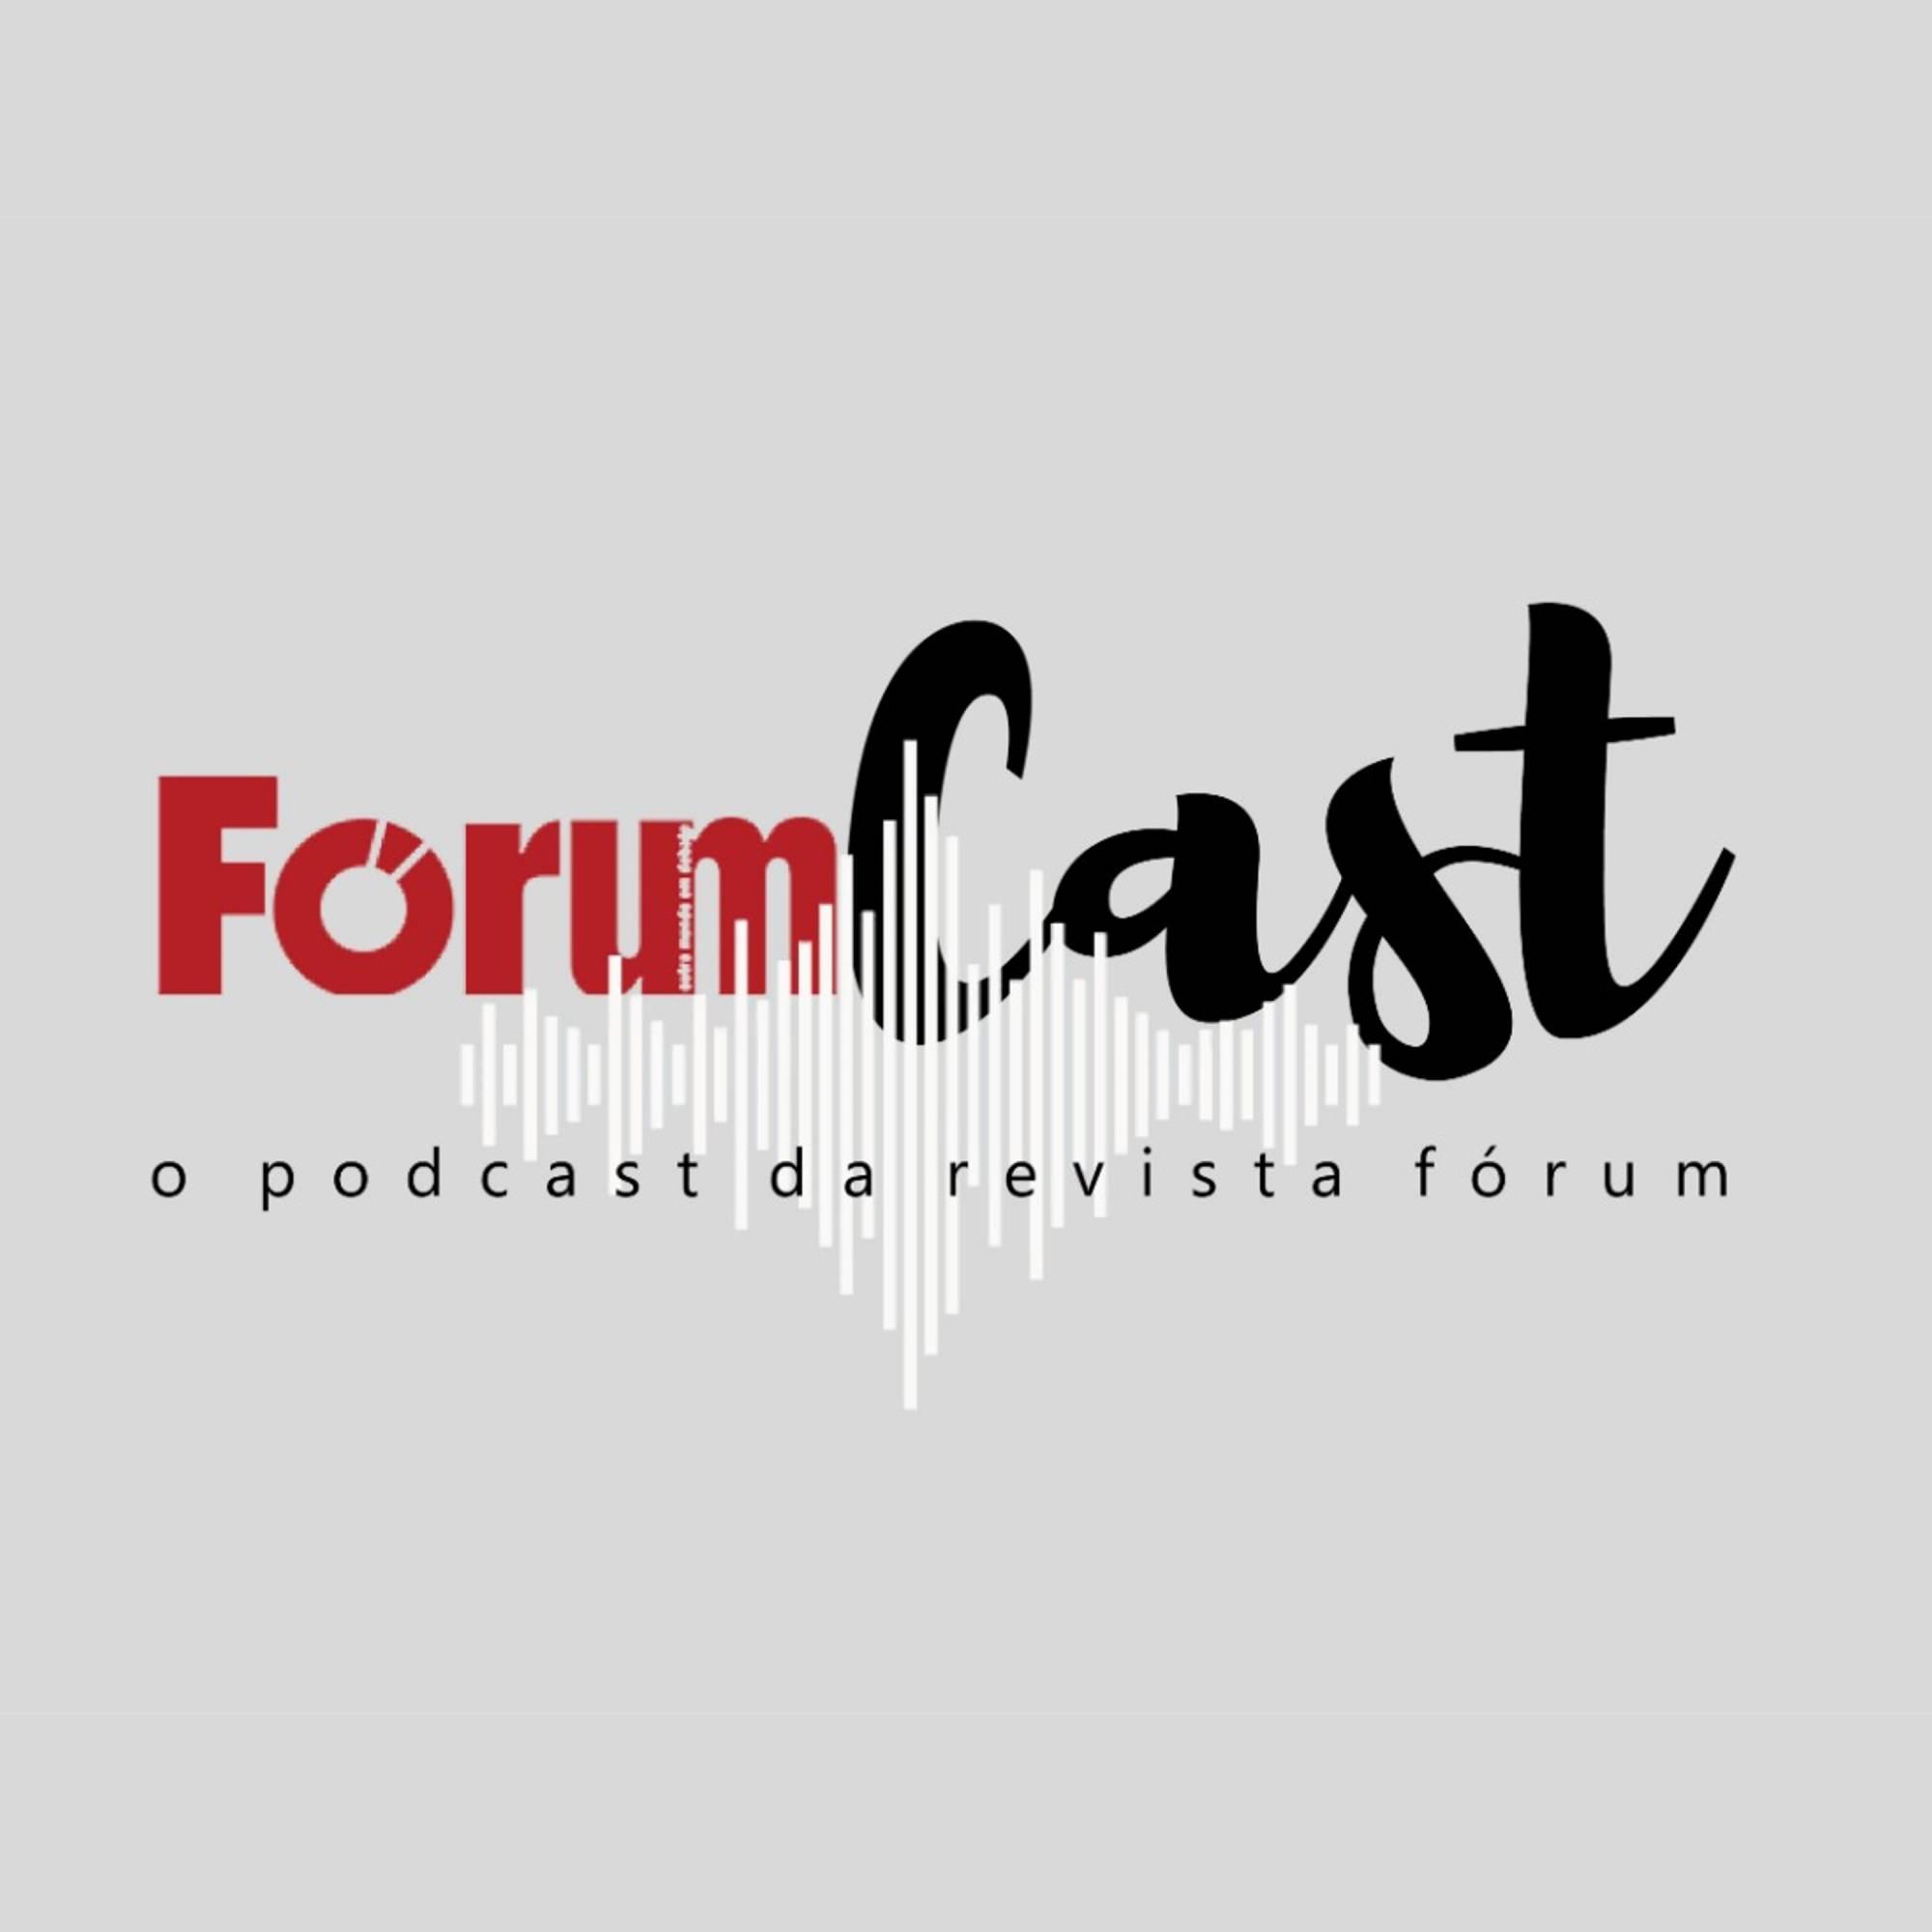 FórumCast